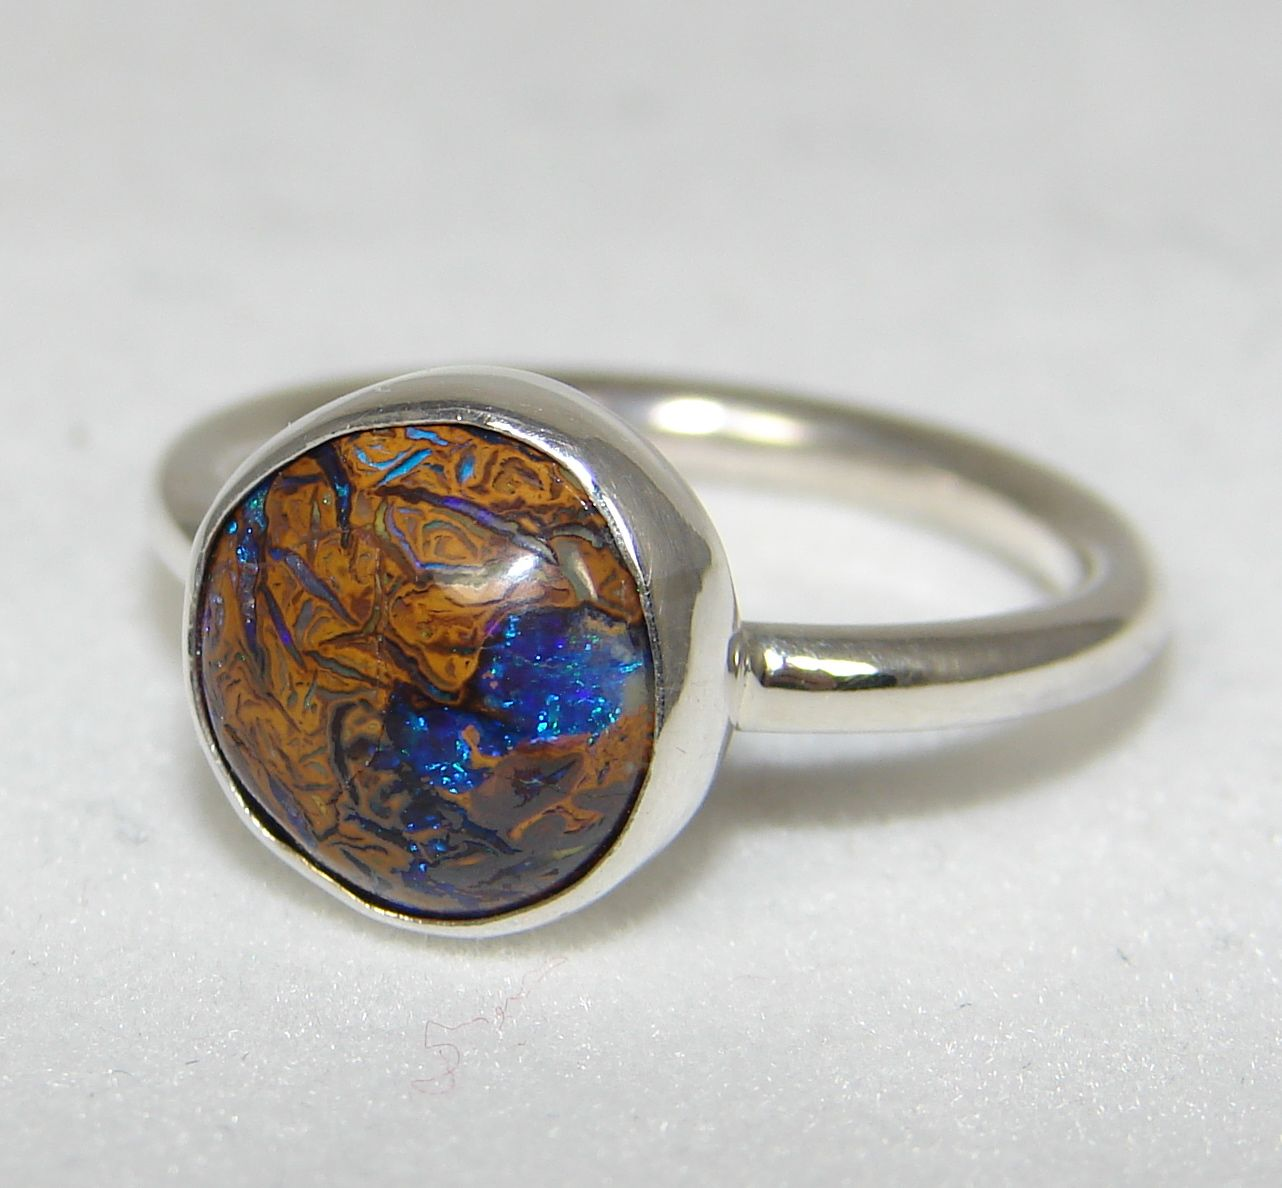 SOLD Sterling silver Australian boulder opal ring size 5 1/2